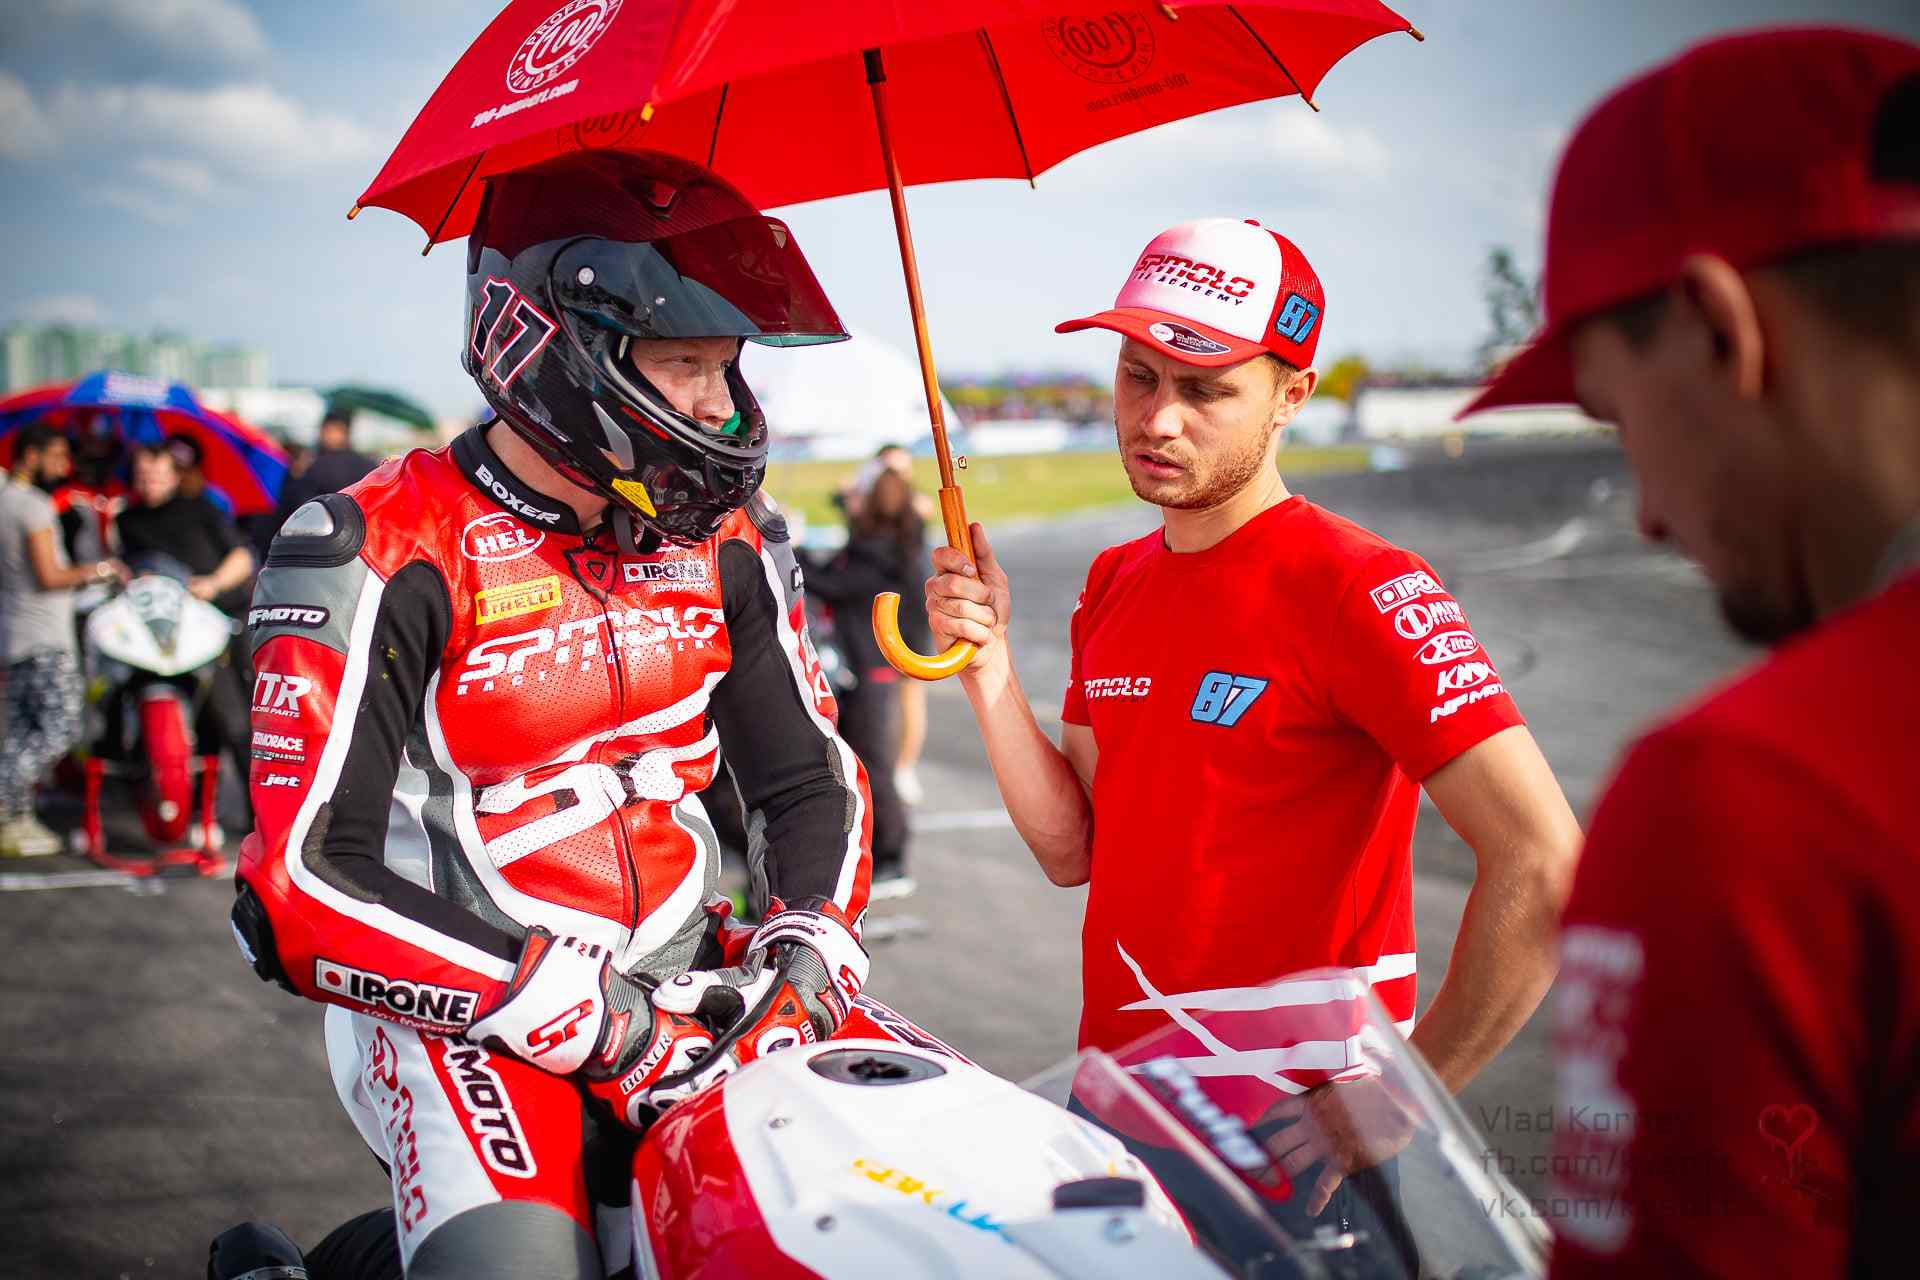 5-6_etap_MotoGPUkraine_147